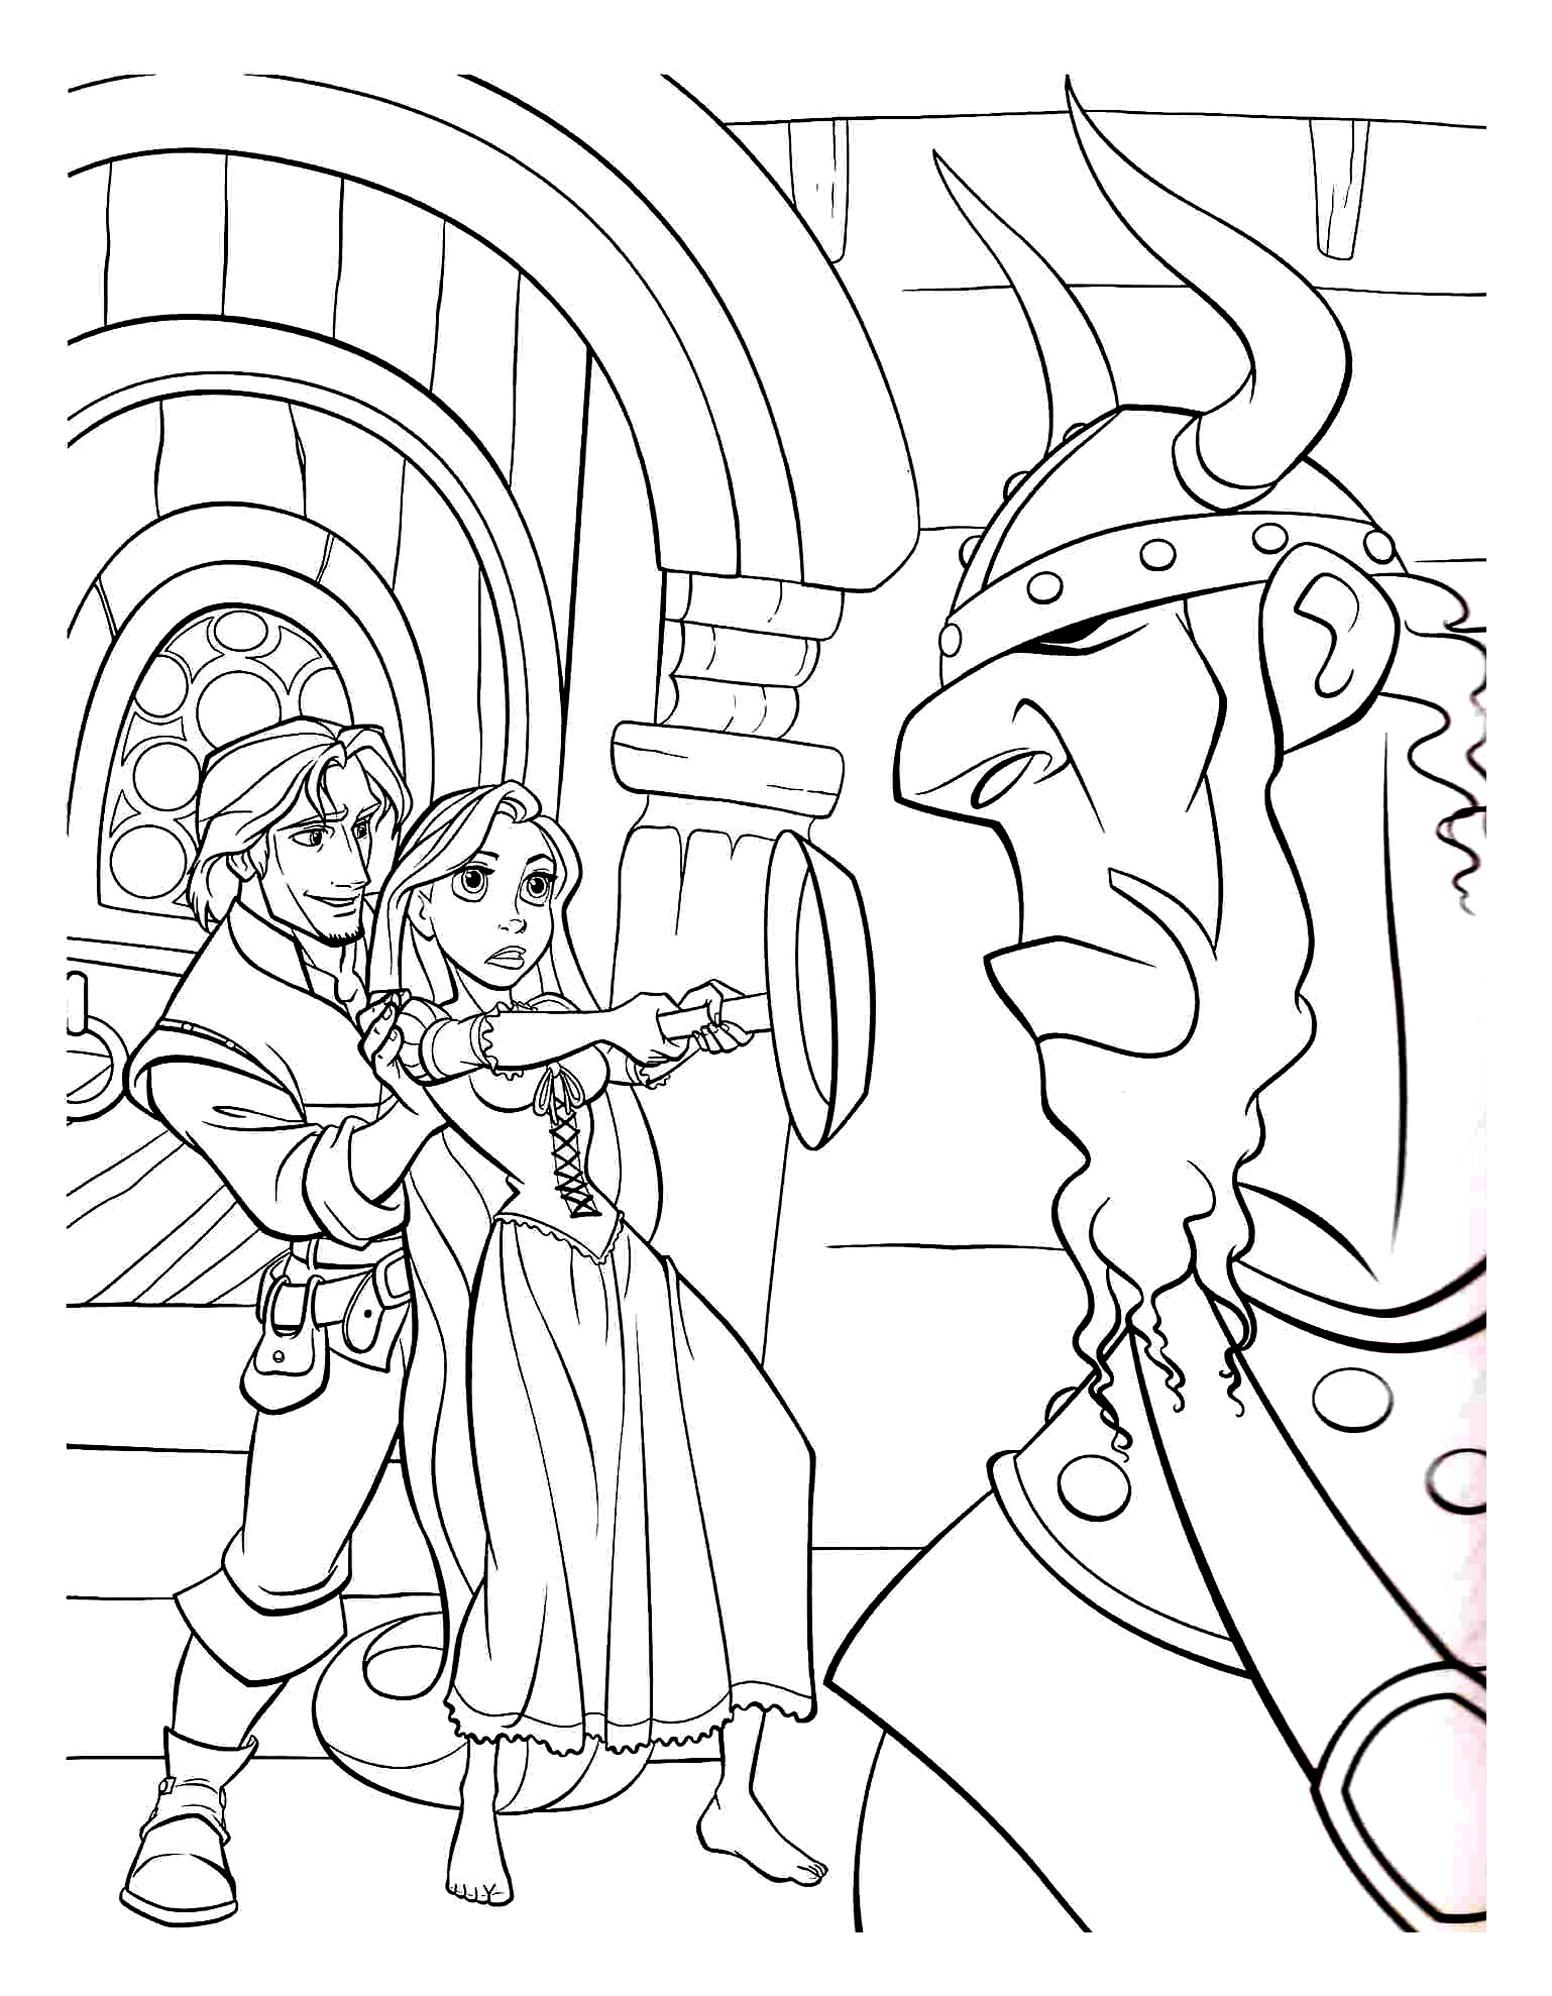 Rapunzel protects Flynn rider